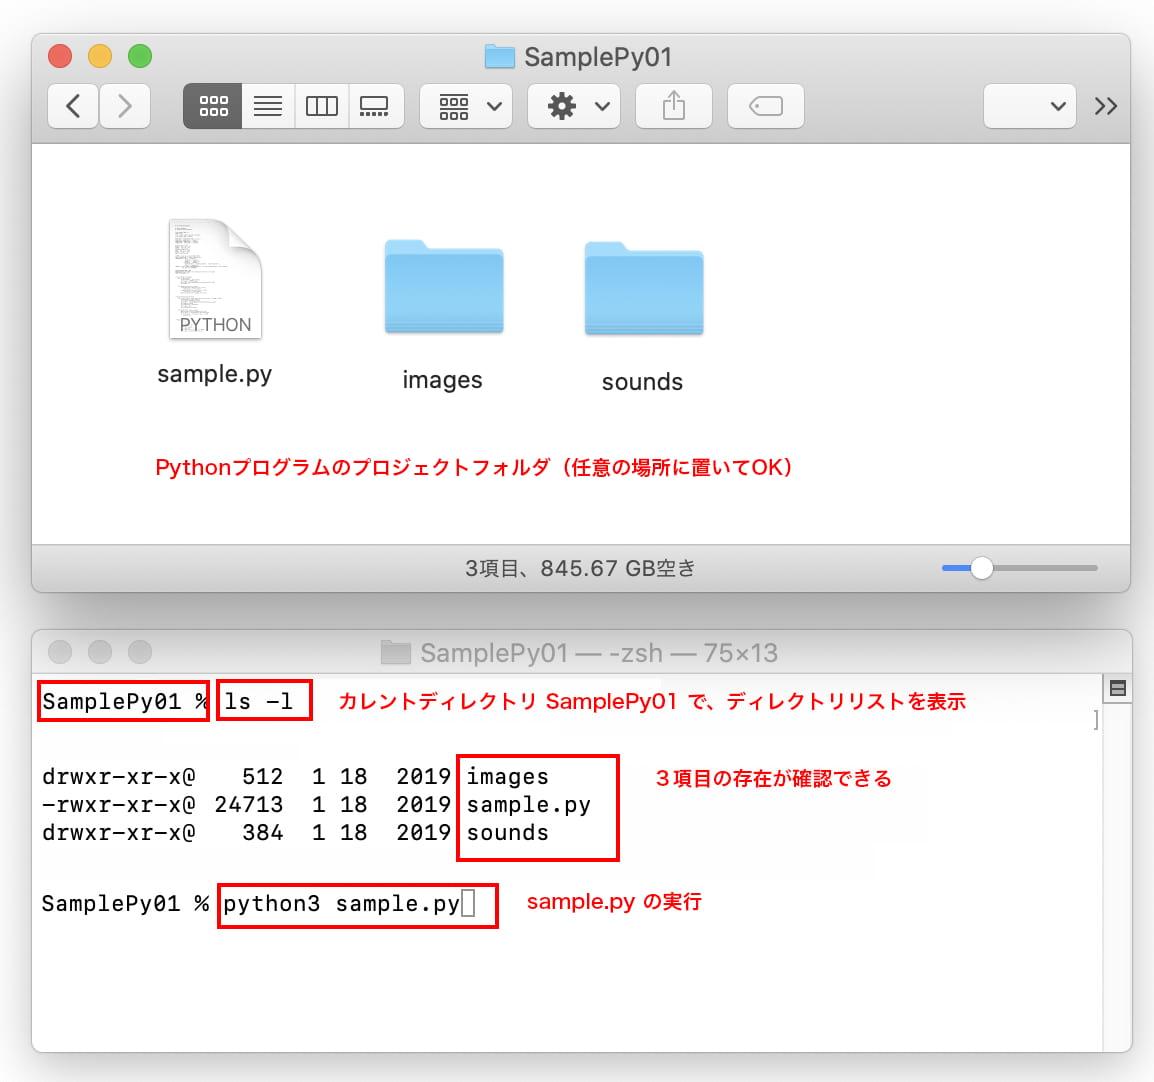 SamplePy01.jpg